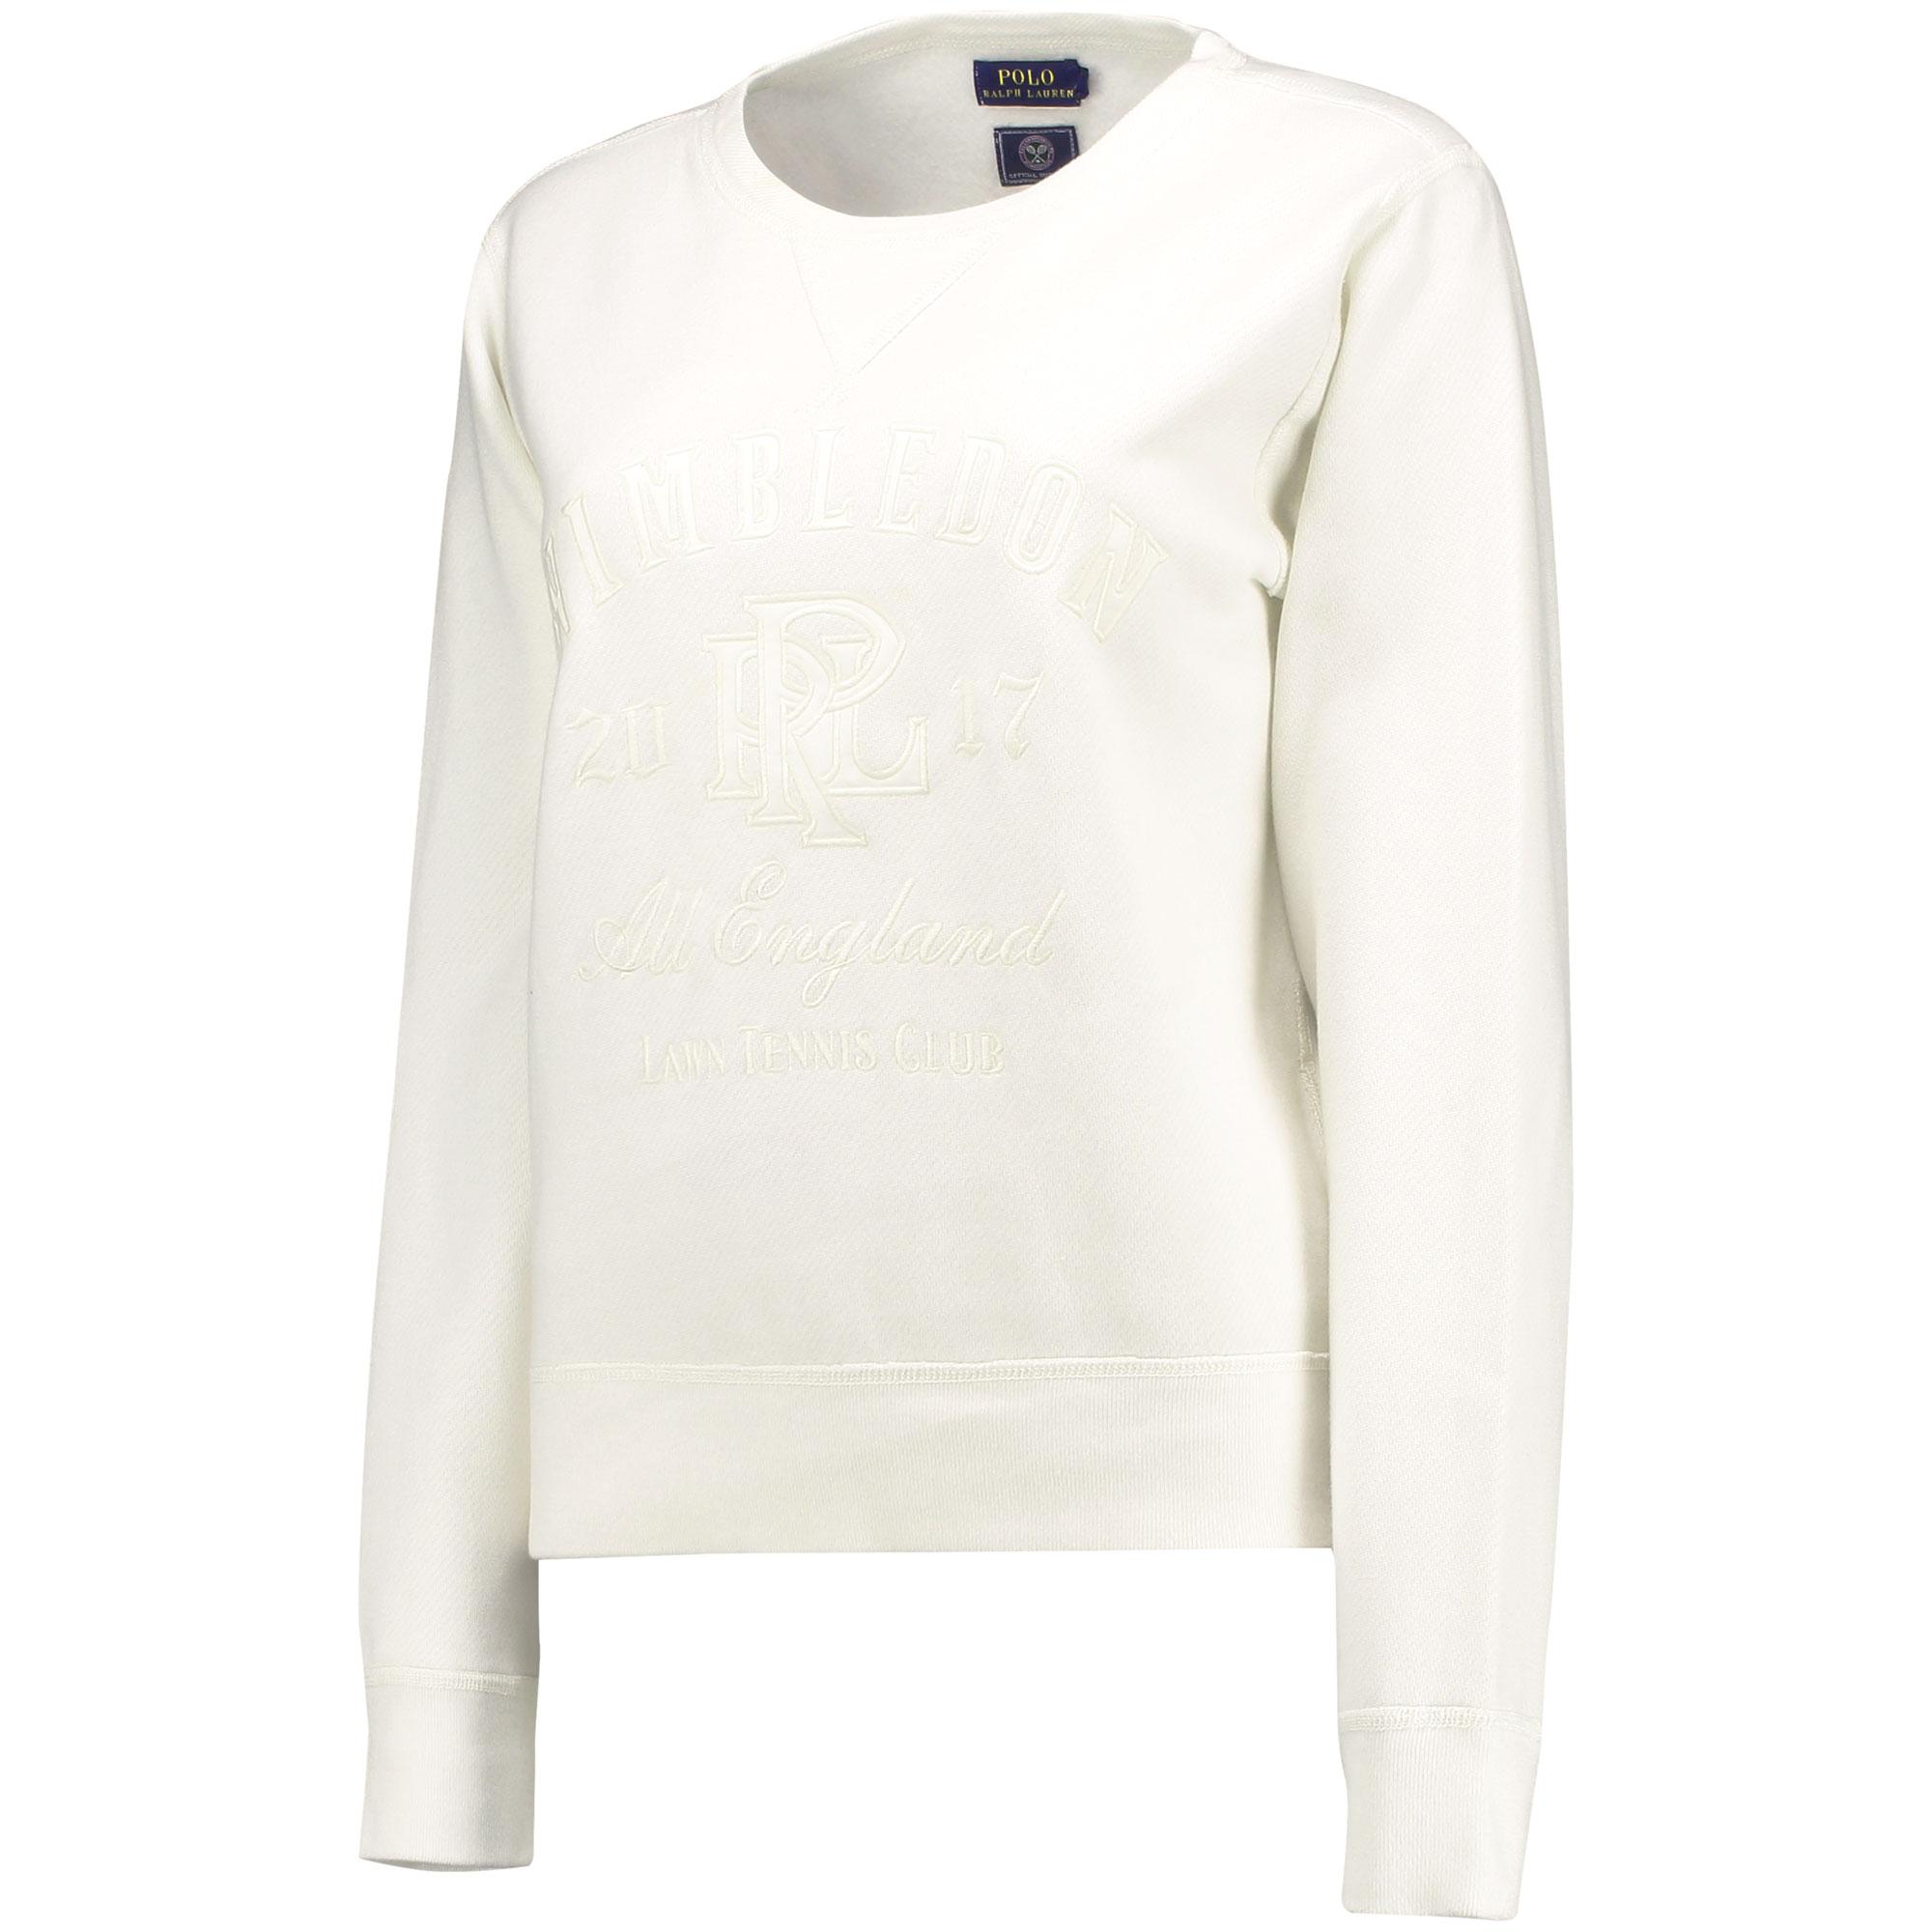 Wimbledon Ralph Lauren Sweatshirt - Deckwash White - Ladies